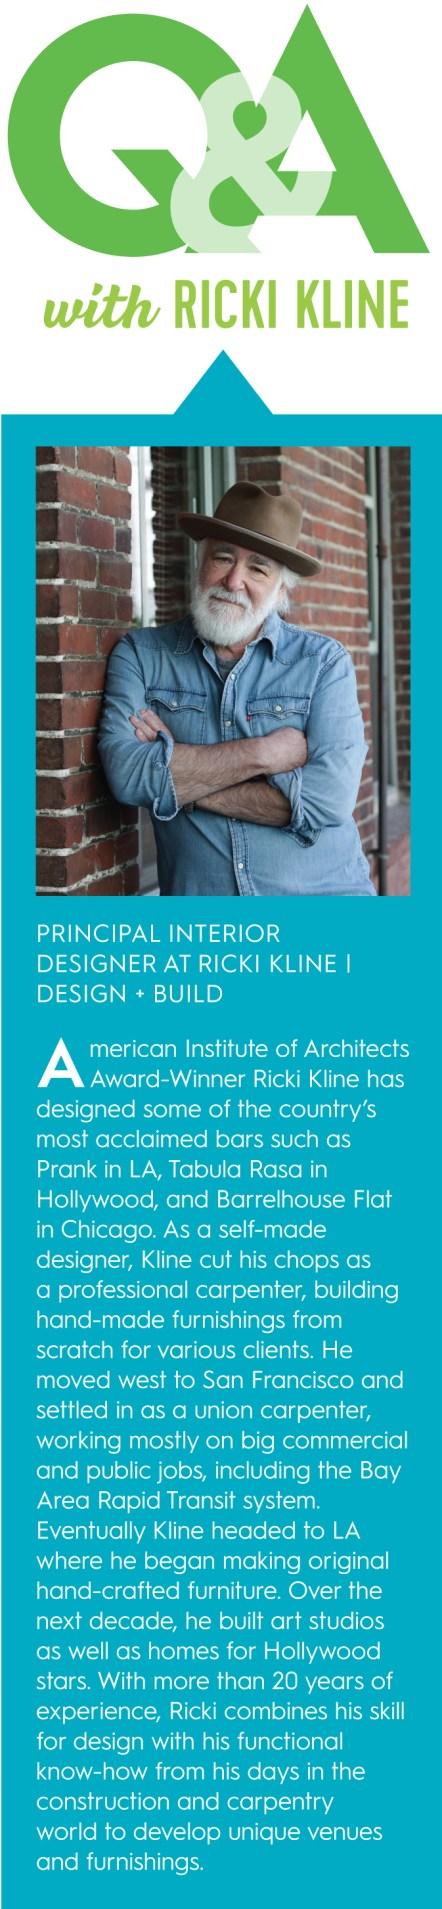 Ricki Kline Interior Designer